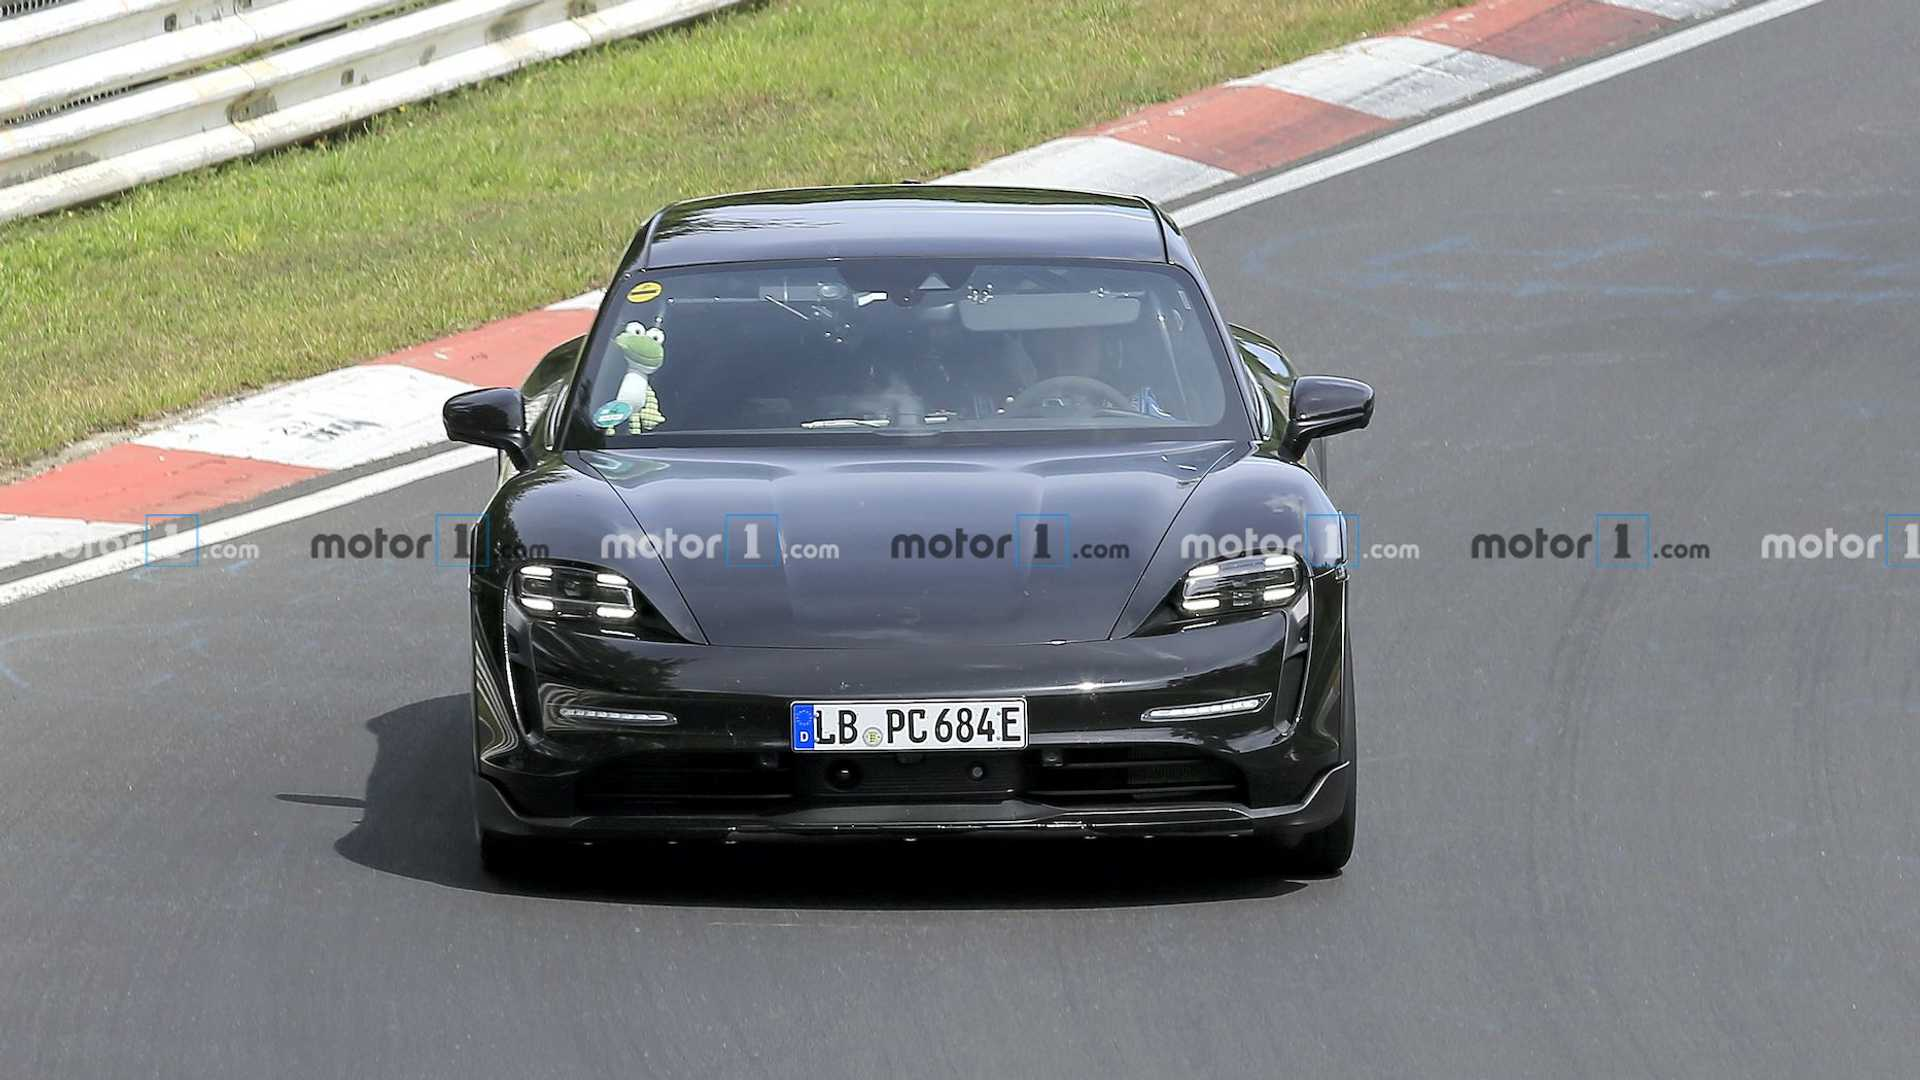 2020 - [Porsche] Taycan Sport Turismo - Page 2 Porsche-taycan-cross-turismo-spied-at-nurburgring-front-shot